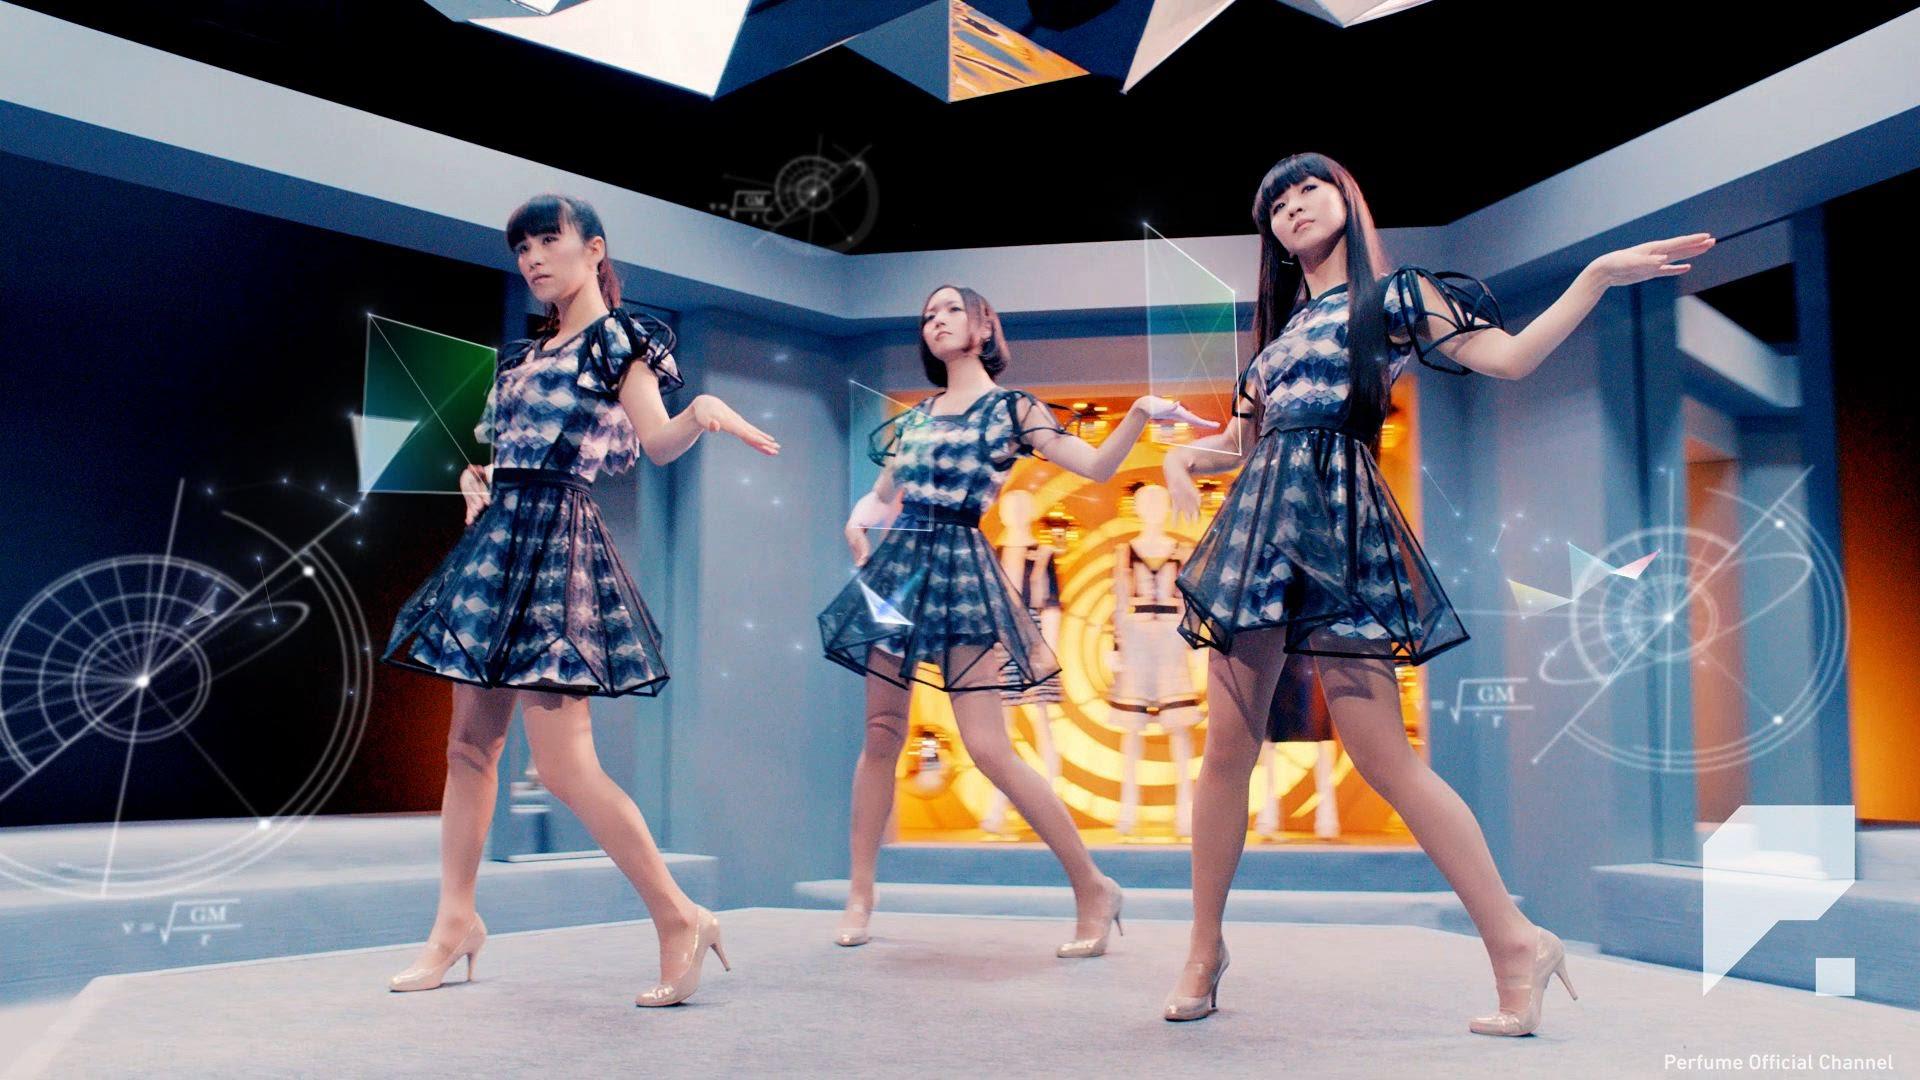 Perfume_Up